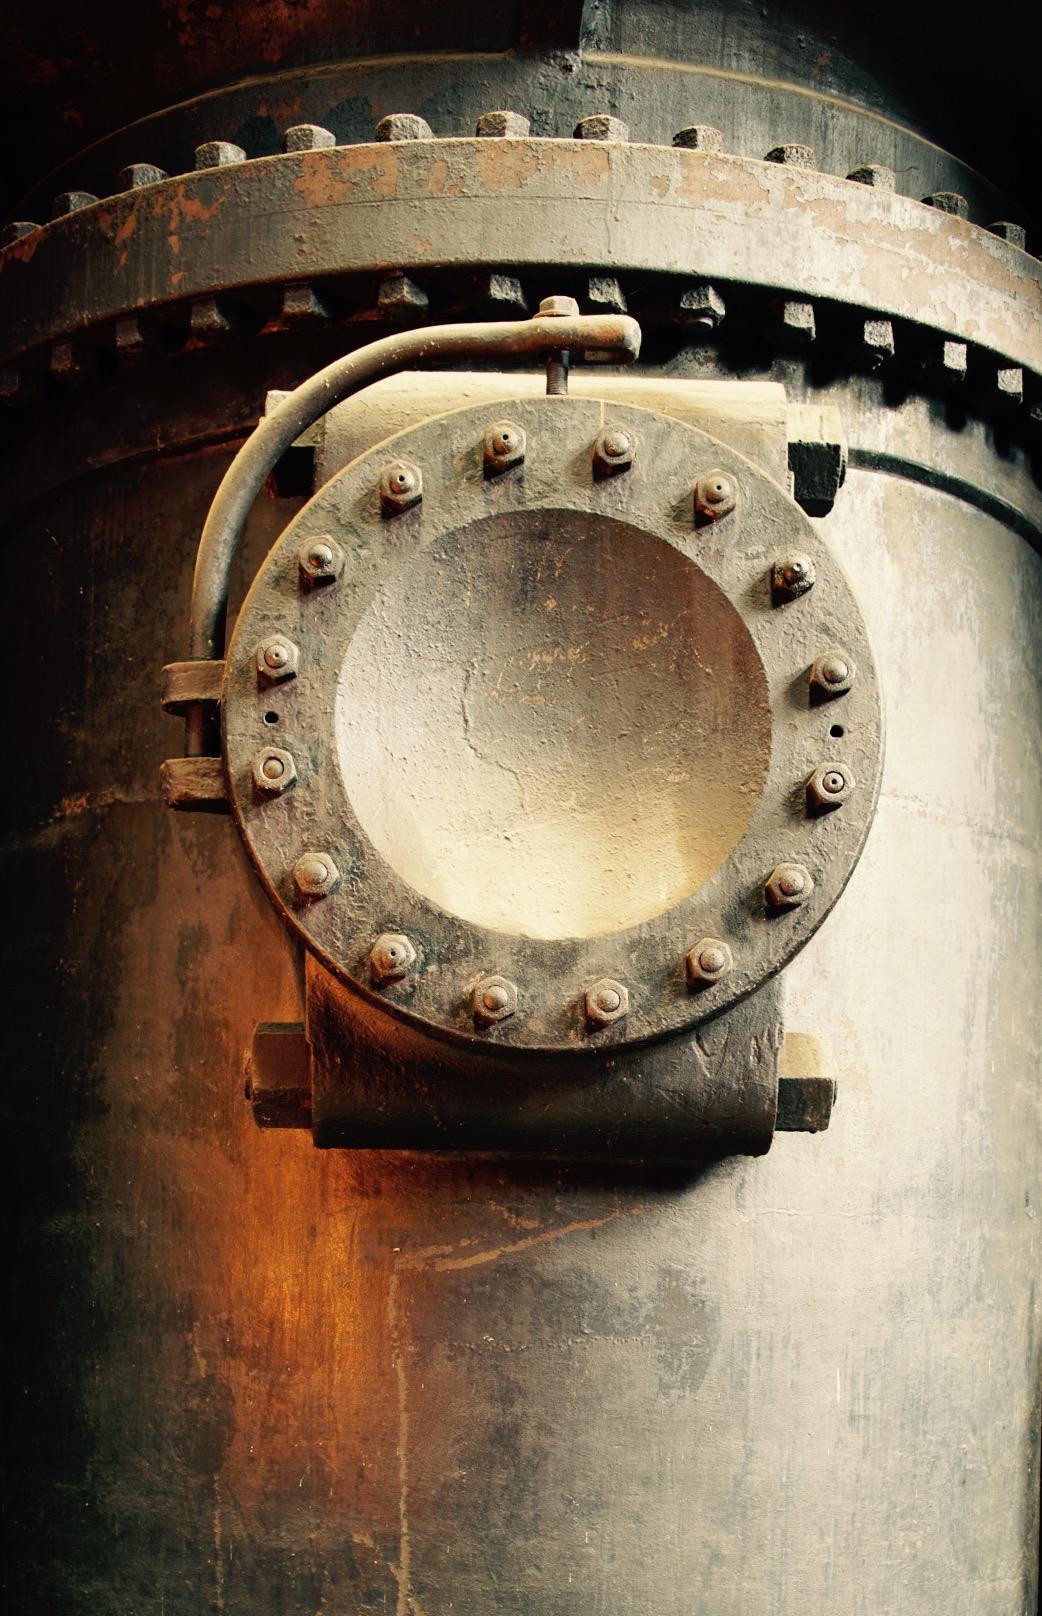 Pump Station by GrahamWelland in GrahamWelland